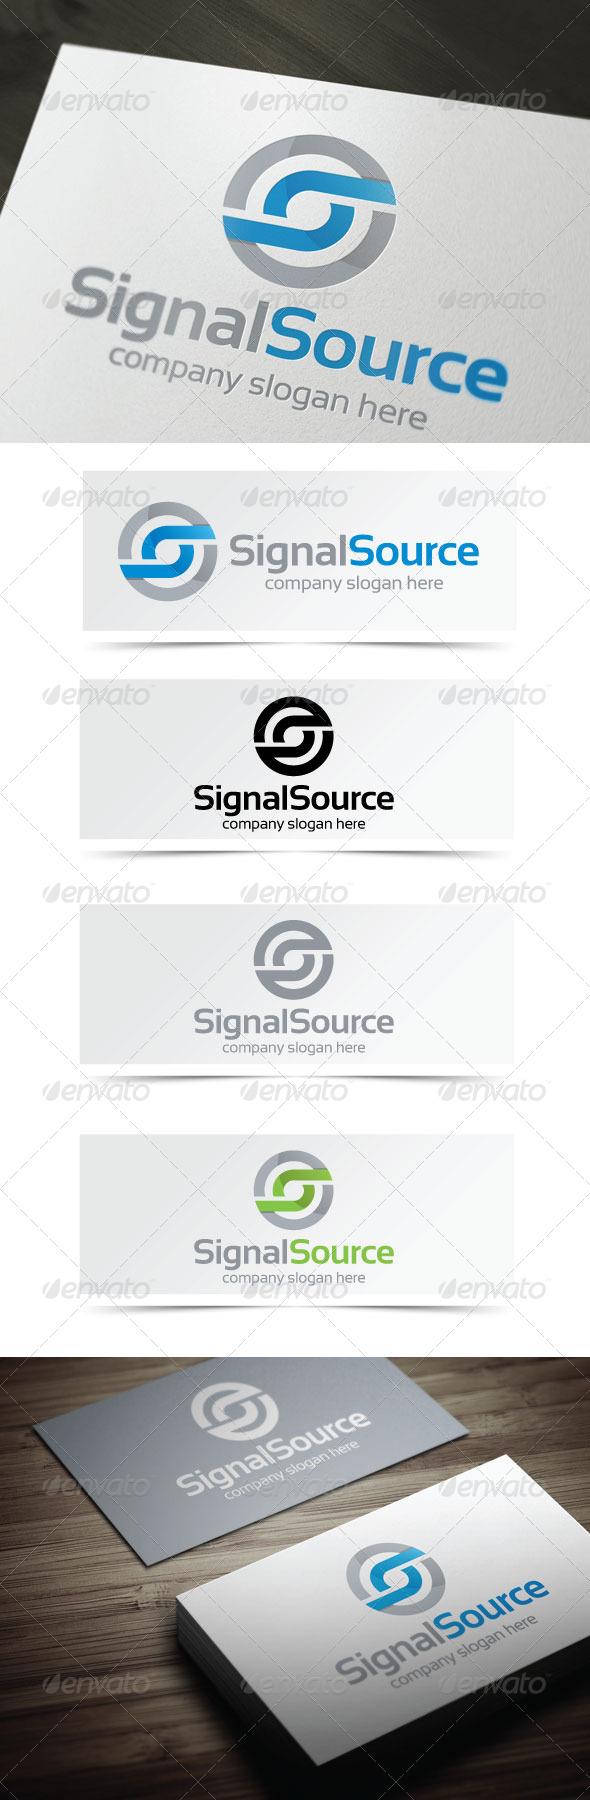 GraphicRiver Signal Source 4105965